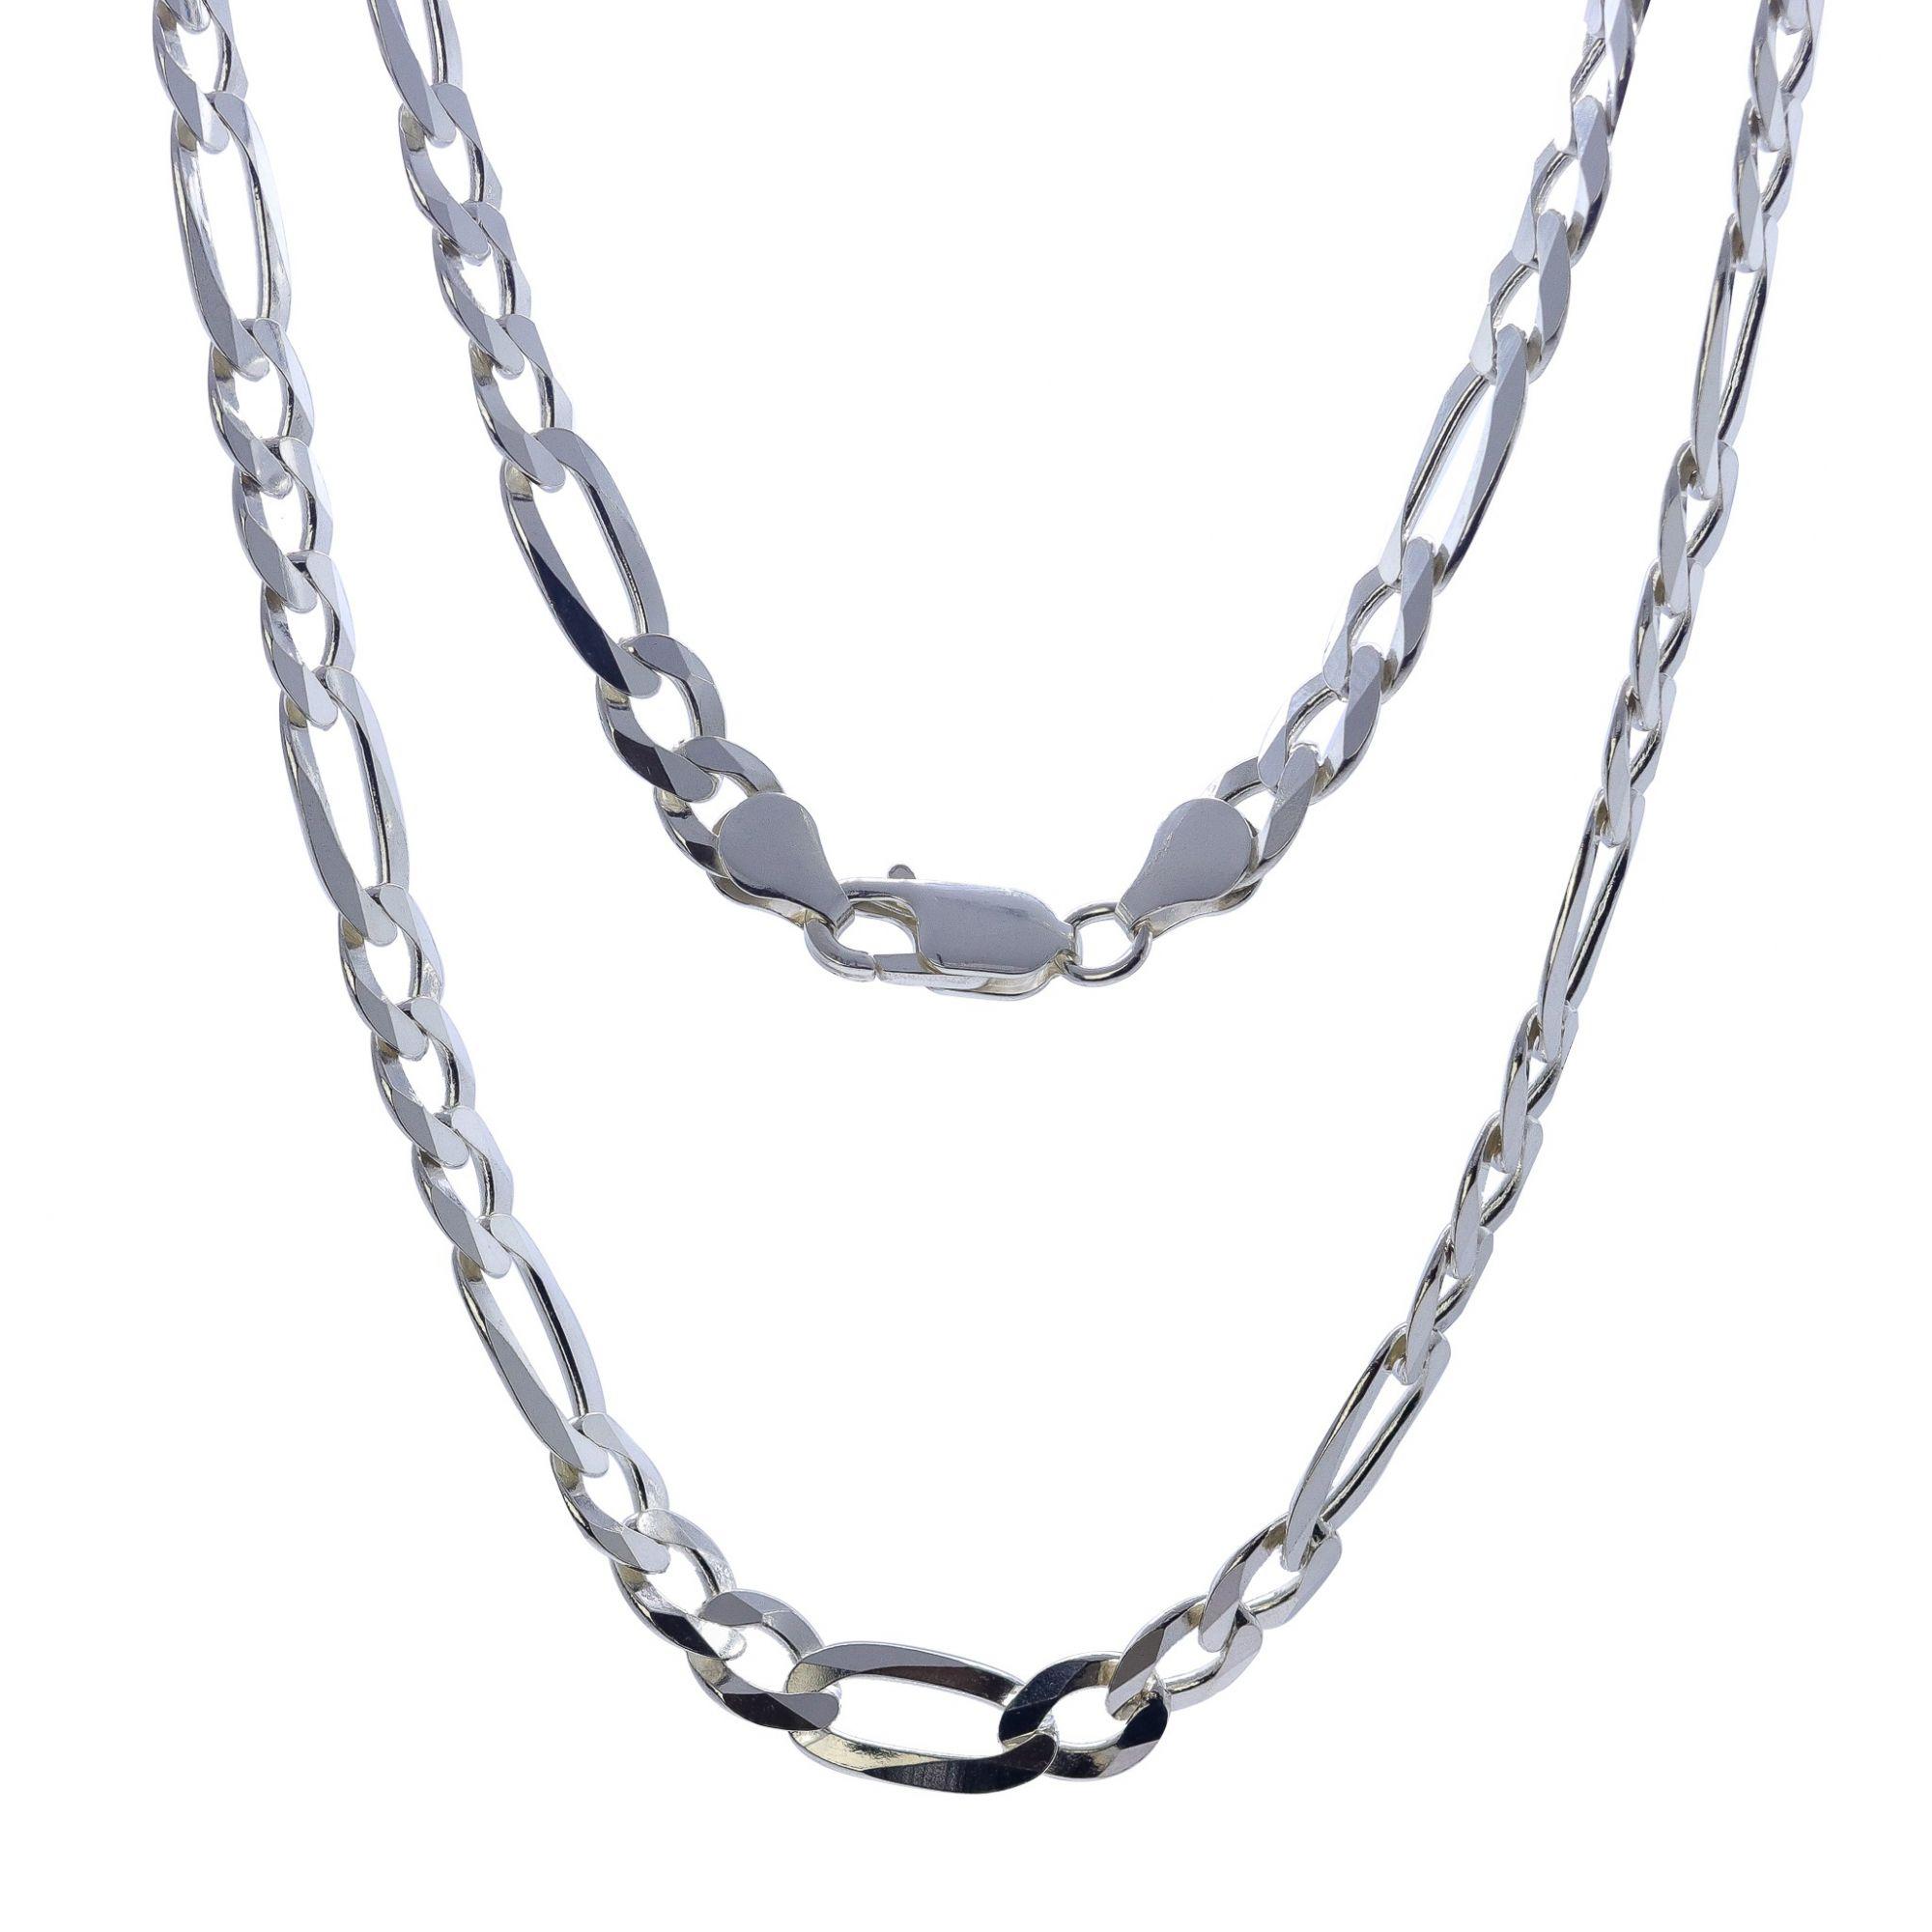 Corrente prata 925 3 por 1 laminada